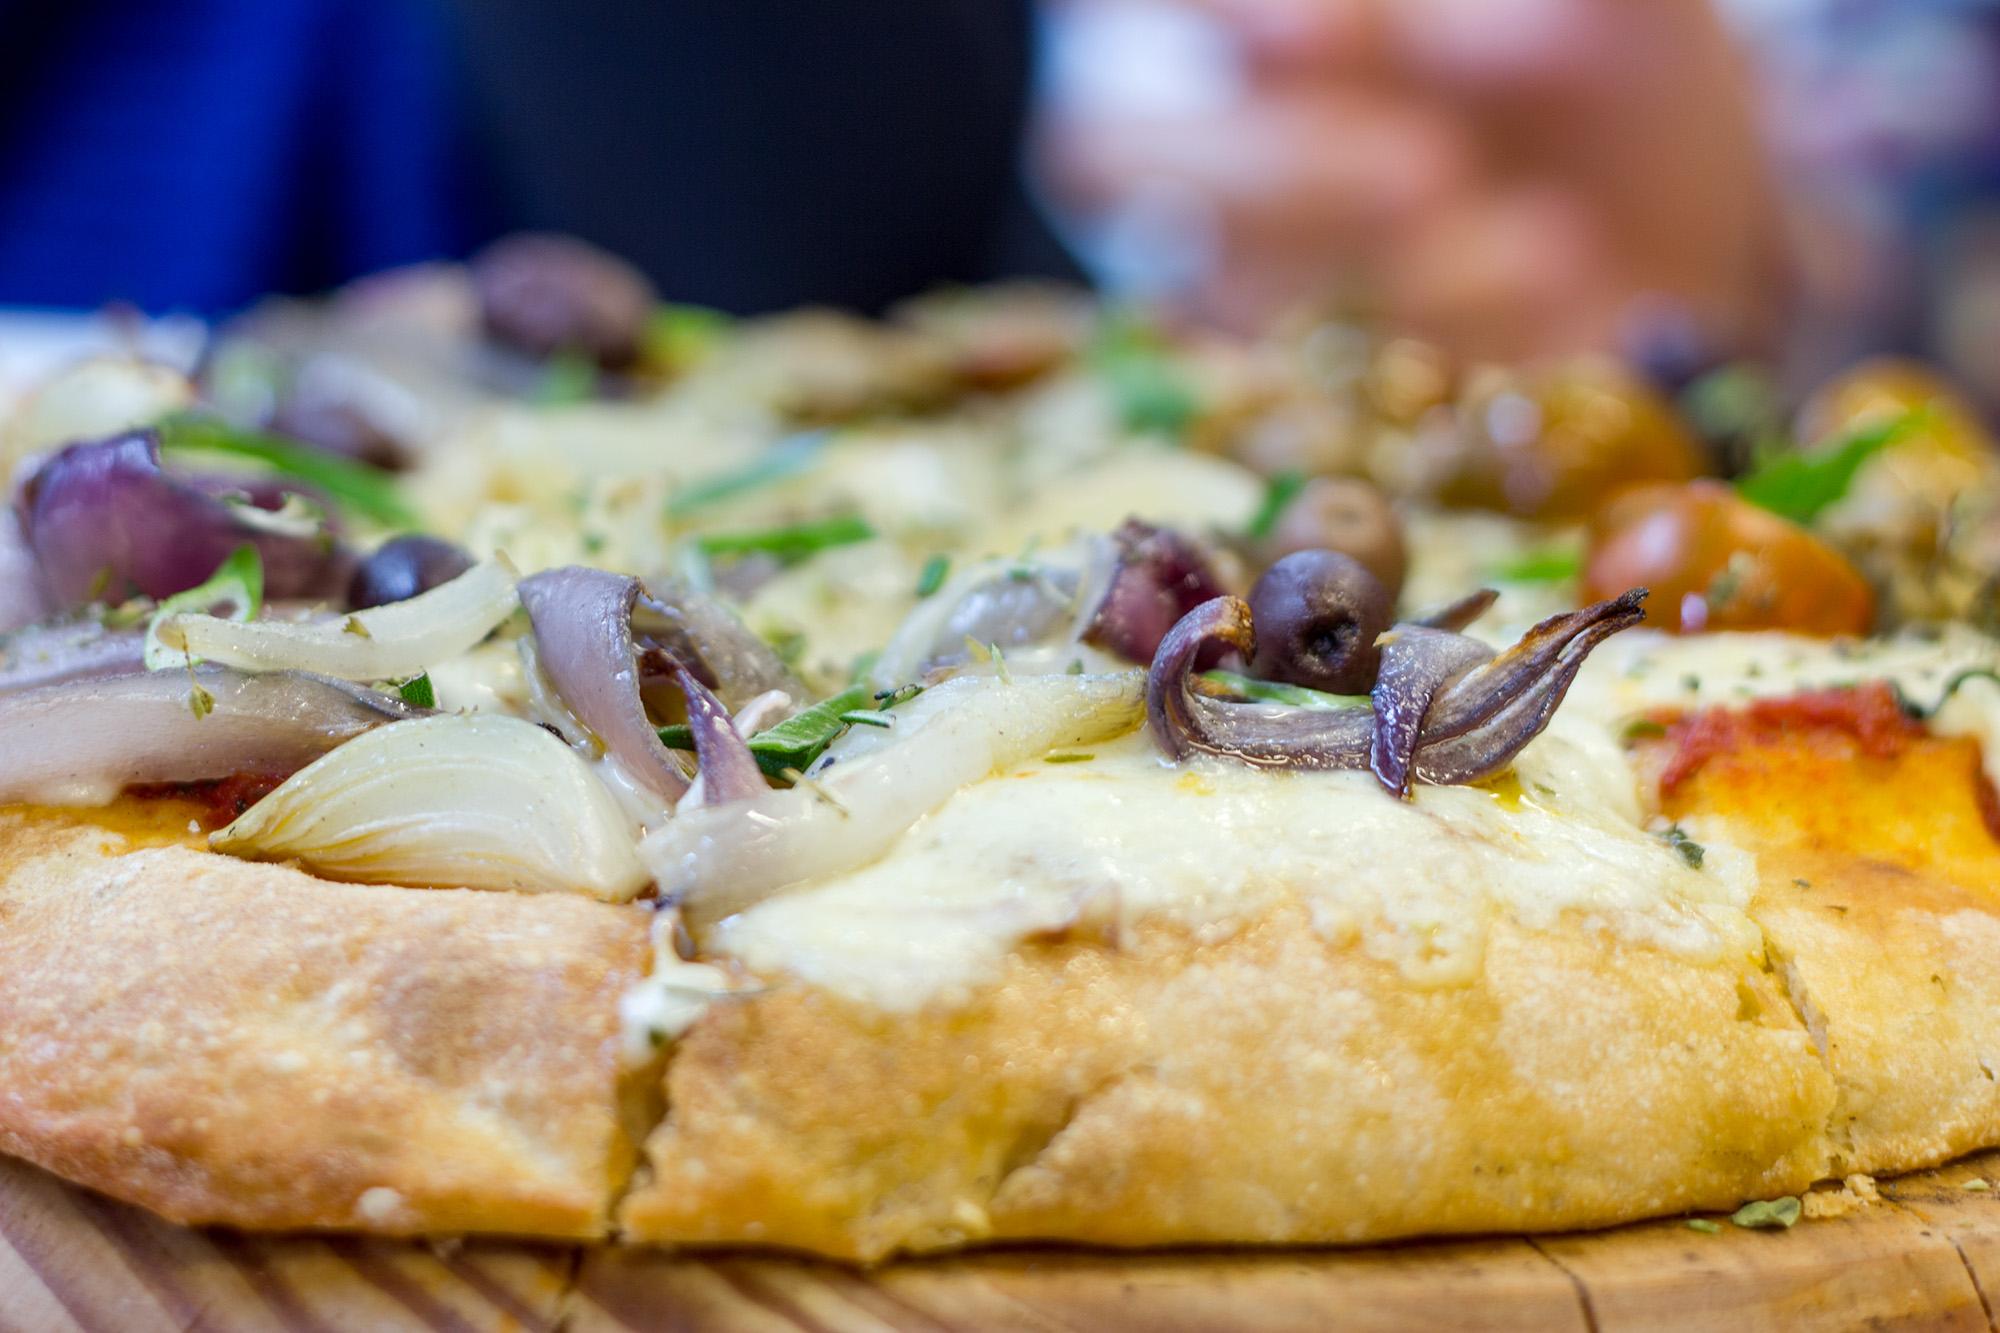 Picsa, brutales pizzas estilo argentino